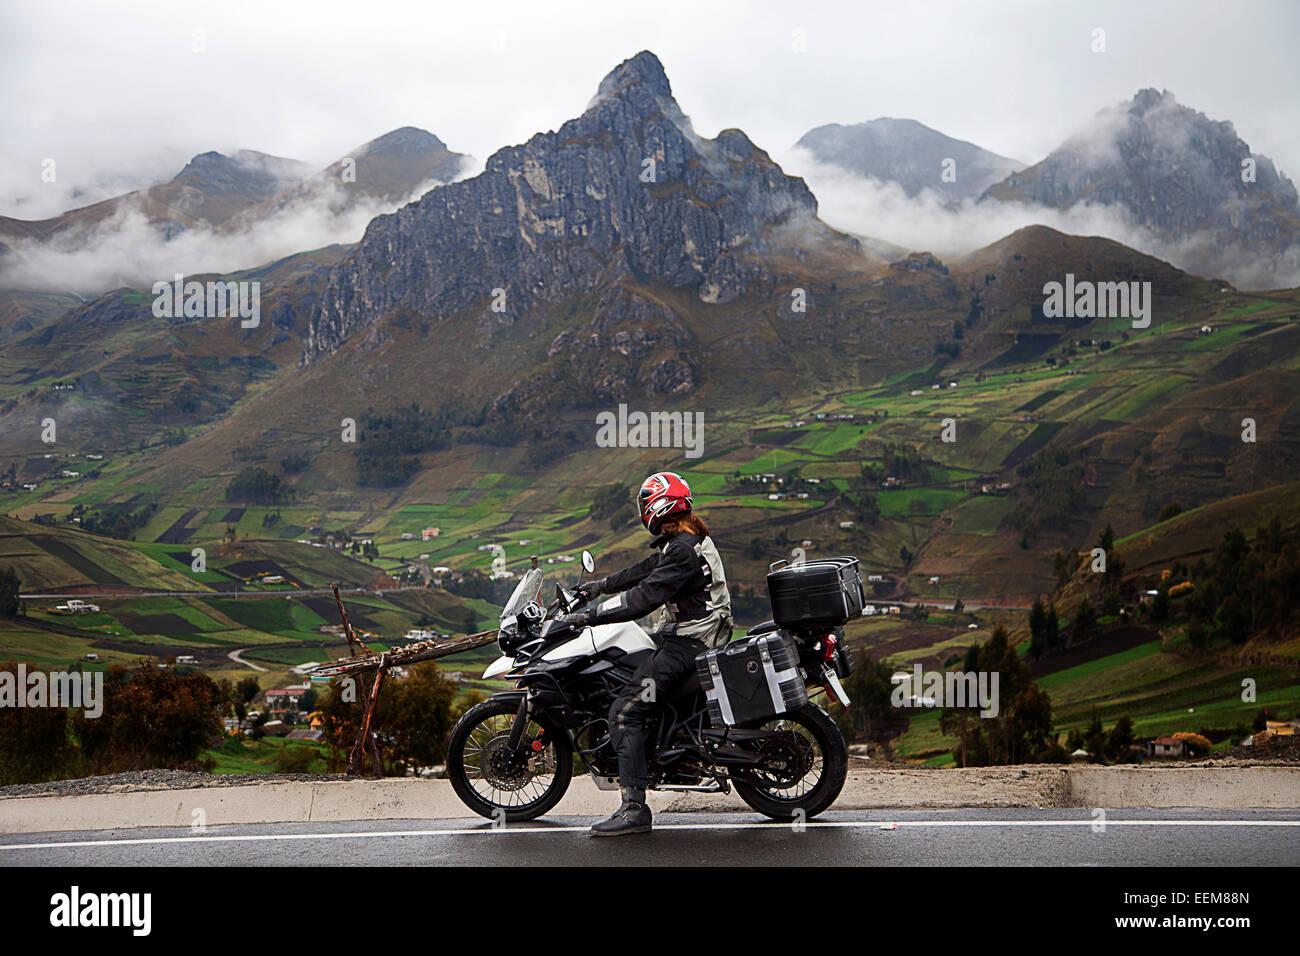 Ecuador, Man on bike on roadside with mountain range in background - Stock Image